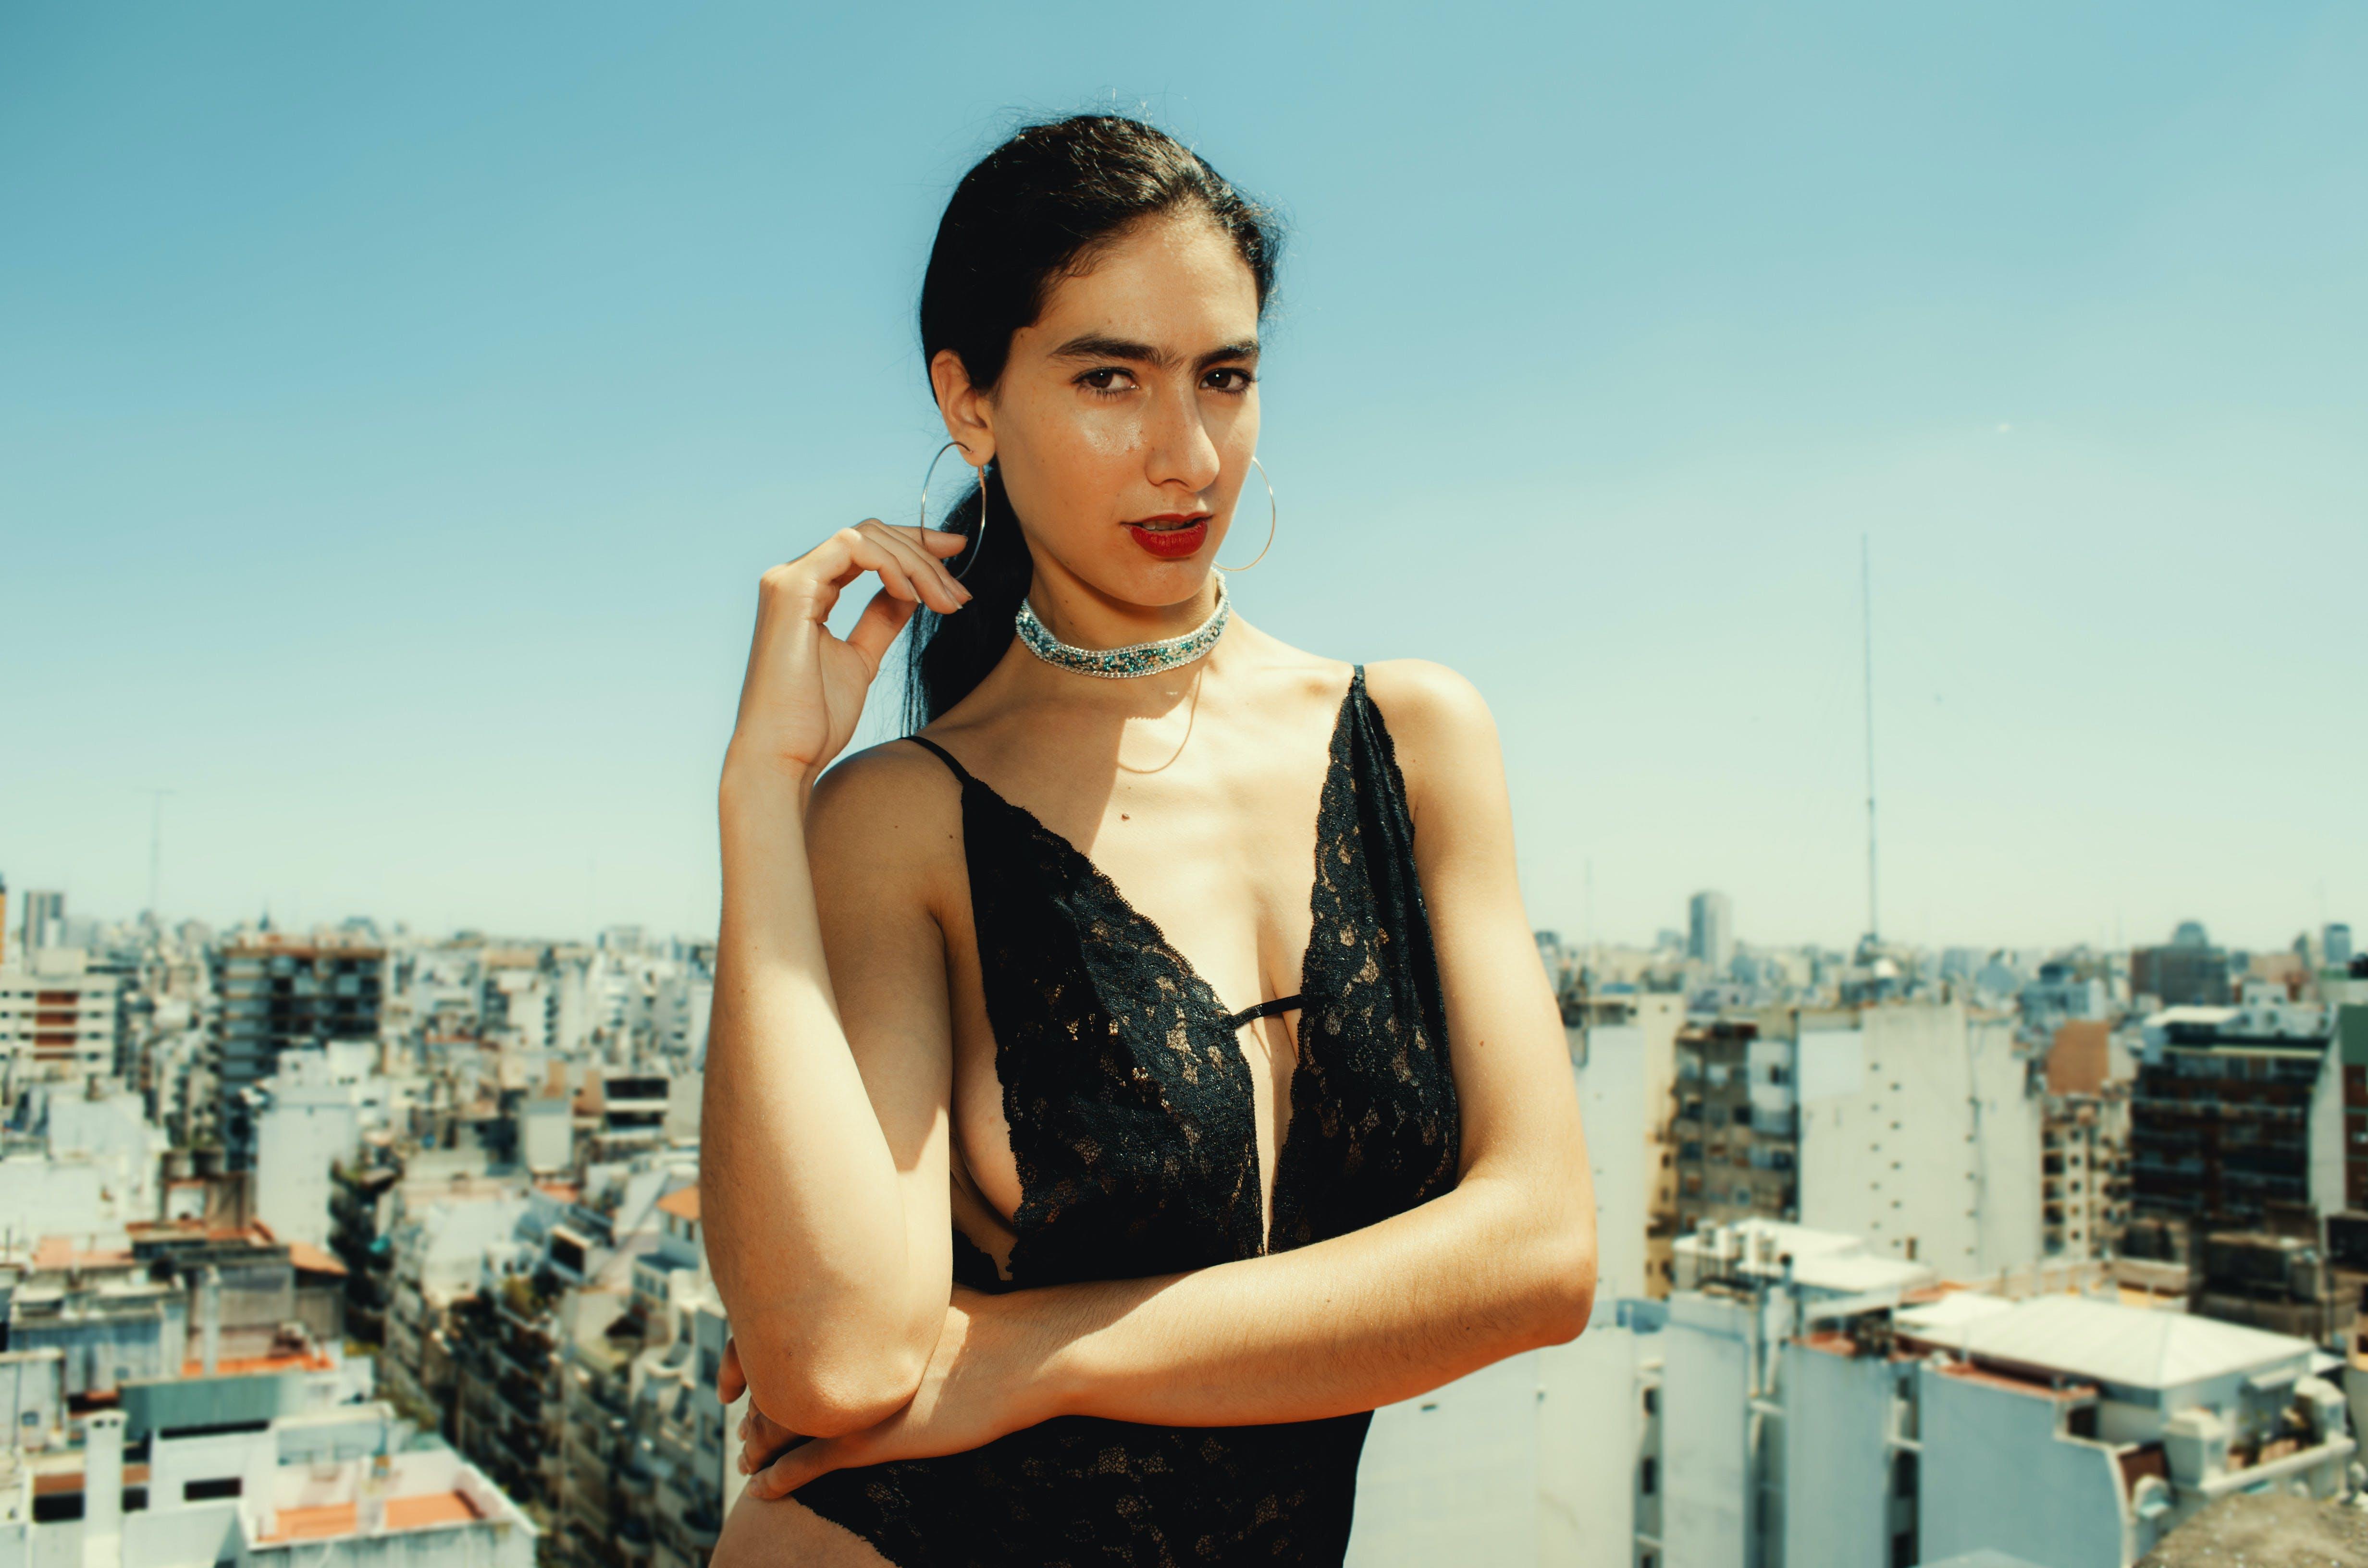 Woman Wearing Black Monokini Behind Highrise Building